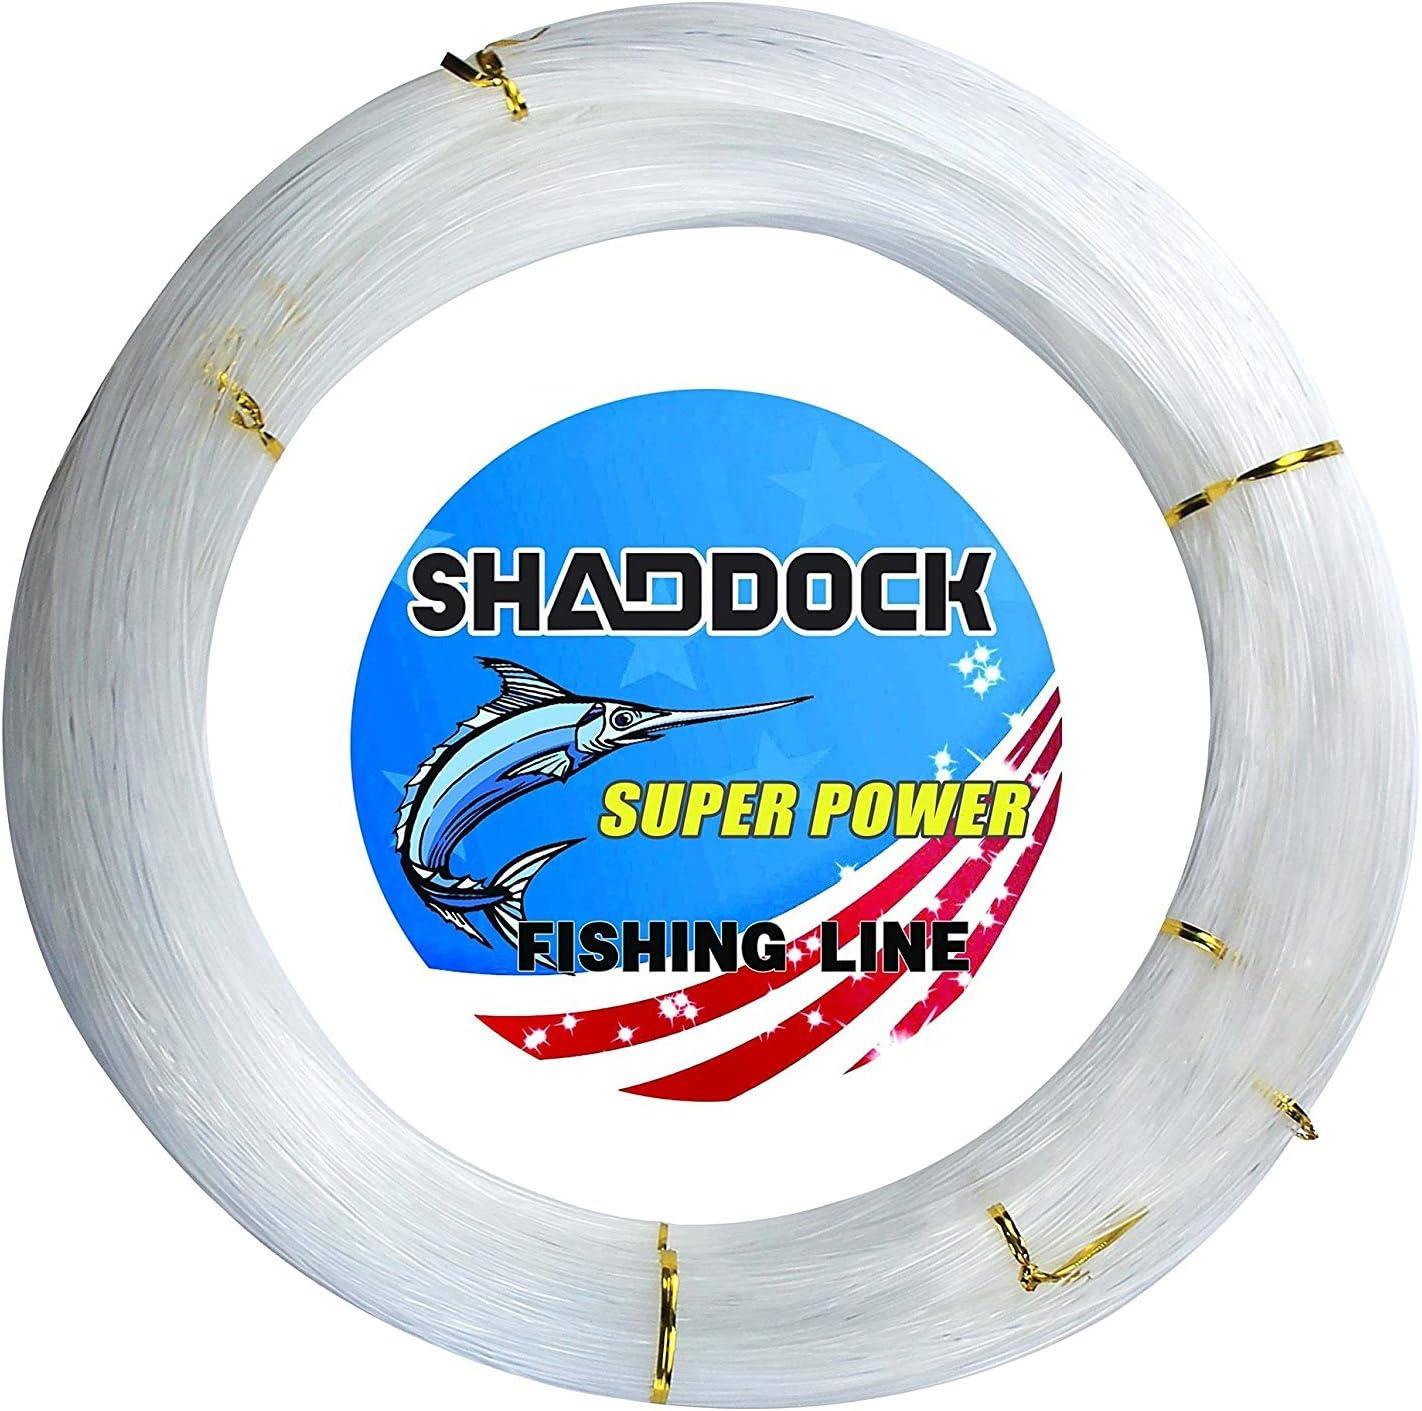 Monofilament Fishing Line 547yds 13 Virginia Beach Mall lb.-396 Nylon lb. Fishi Mono Fixed price for sale